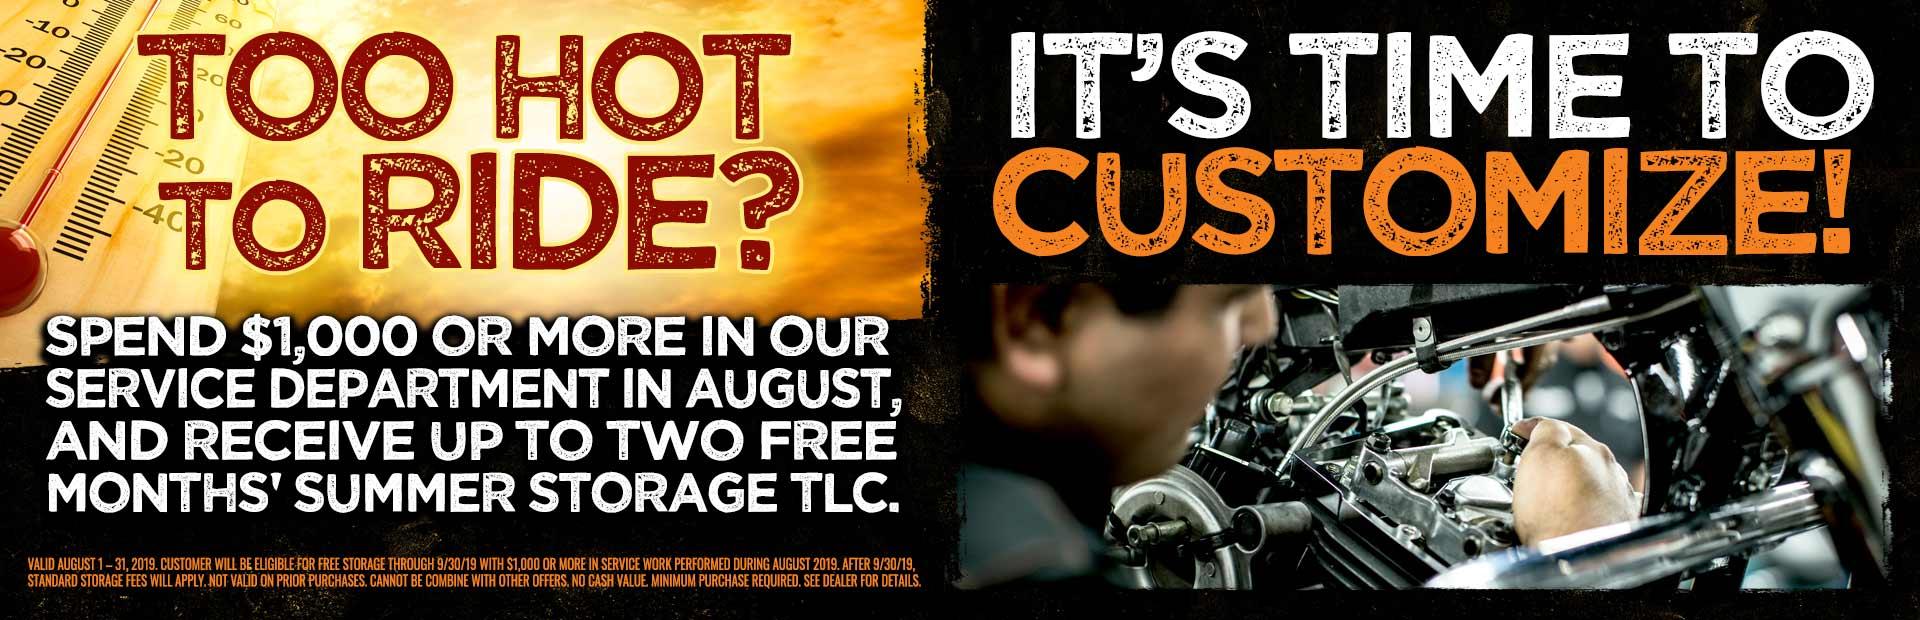 Craigslist N Ms >> Home Southern Thunder Harley Davidson Southaven Ms 662 450 6655